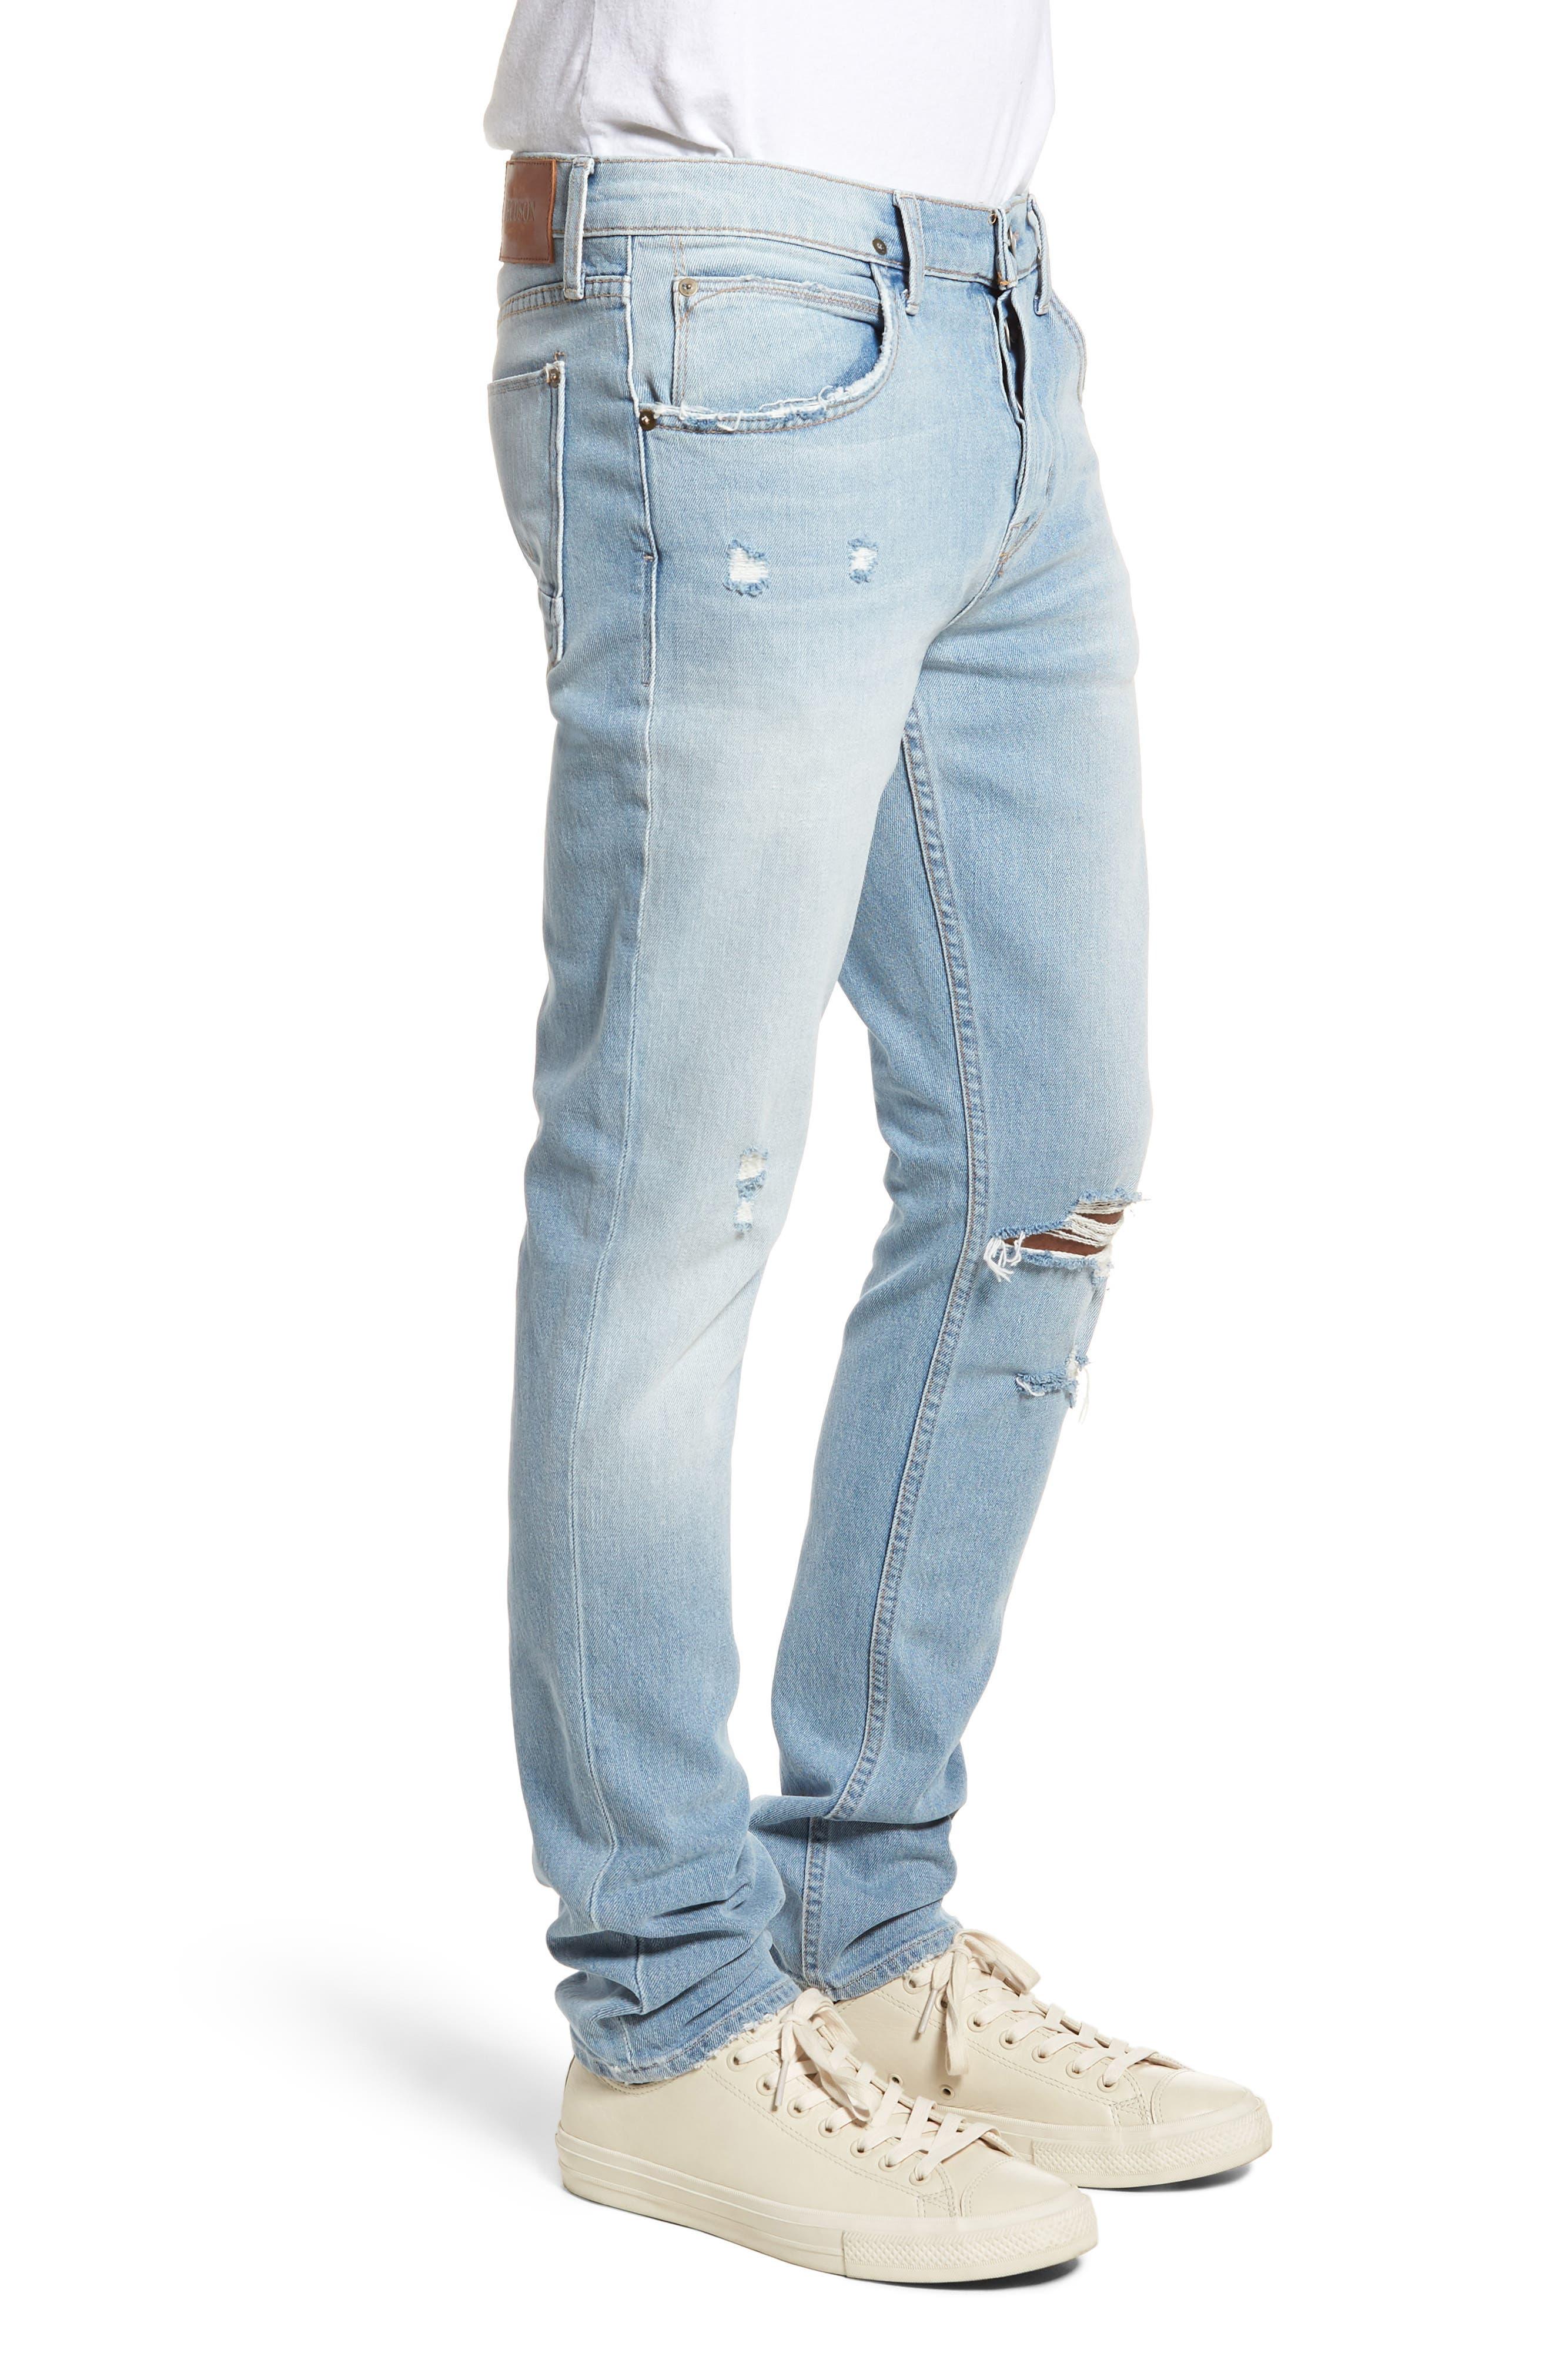 Axl Skinny Fit Jeans,                             Alternate thumbnail 3, color,                             Blaze